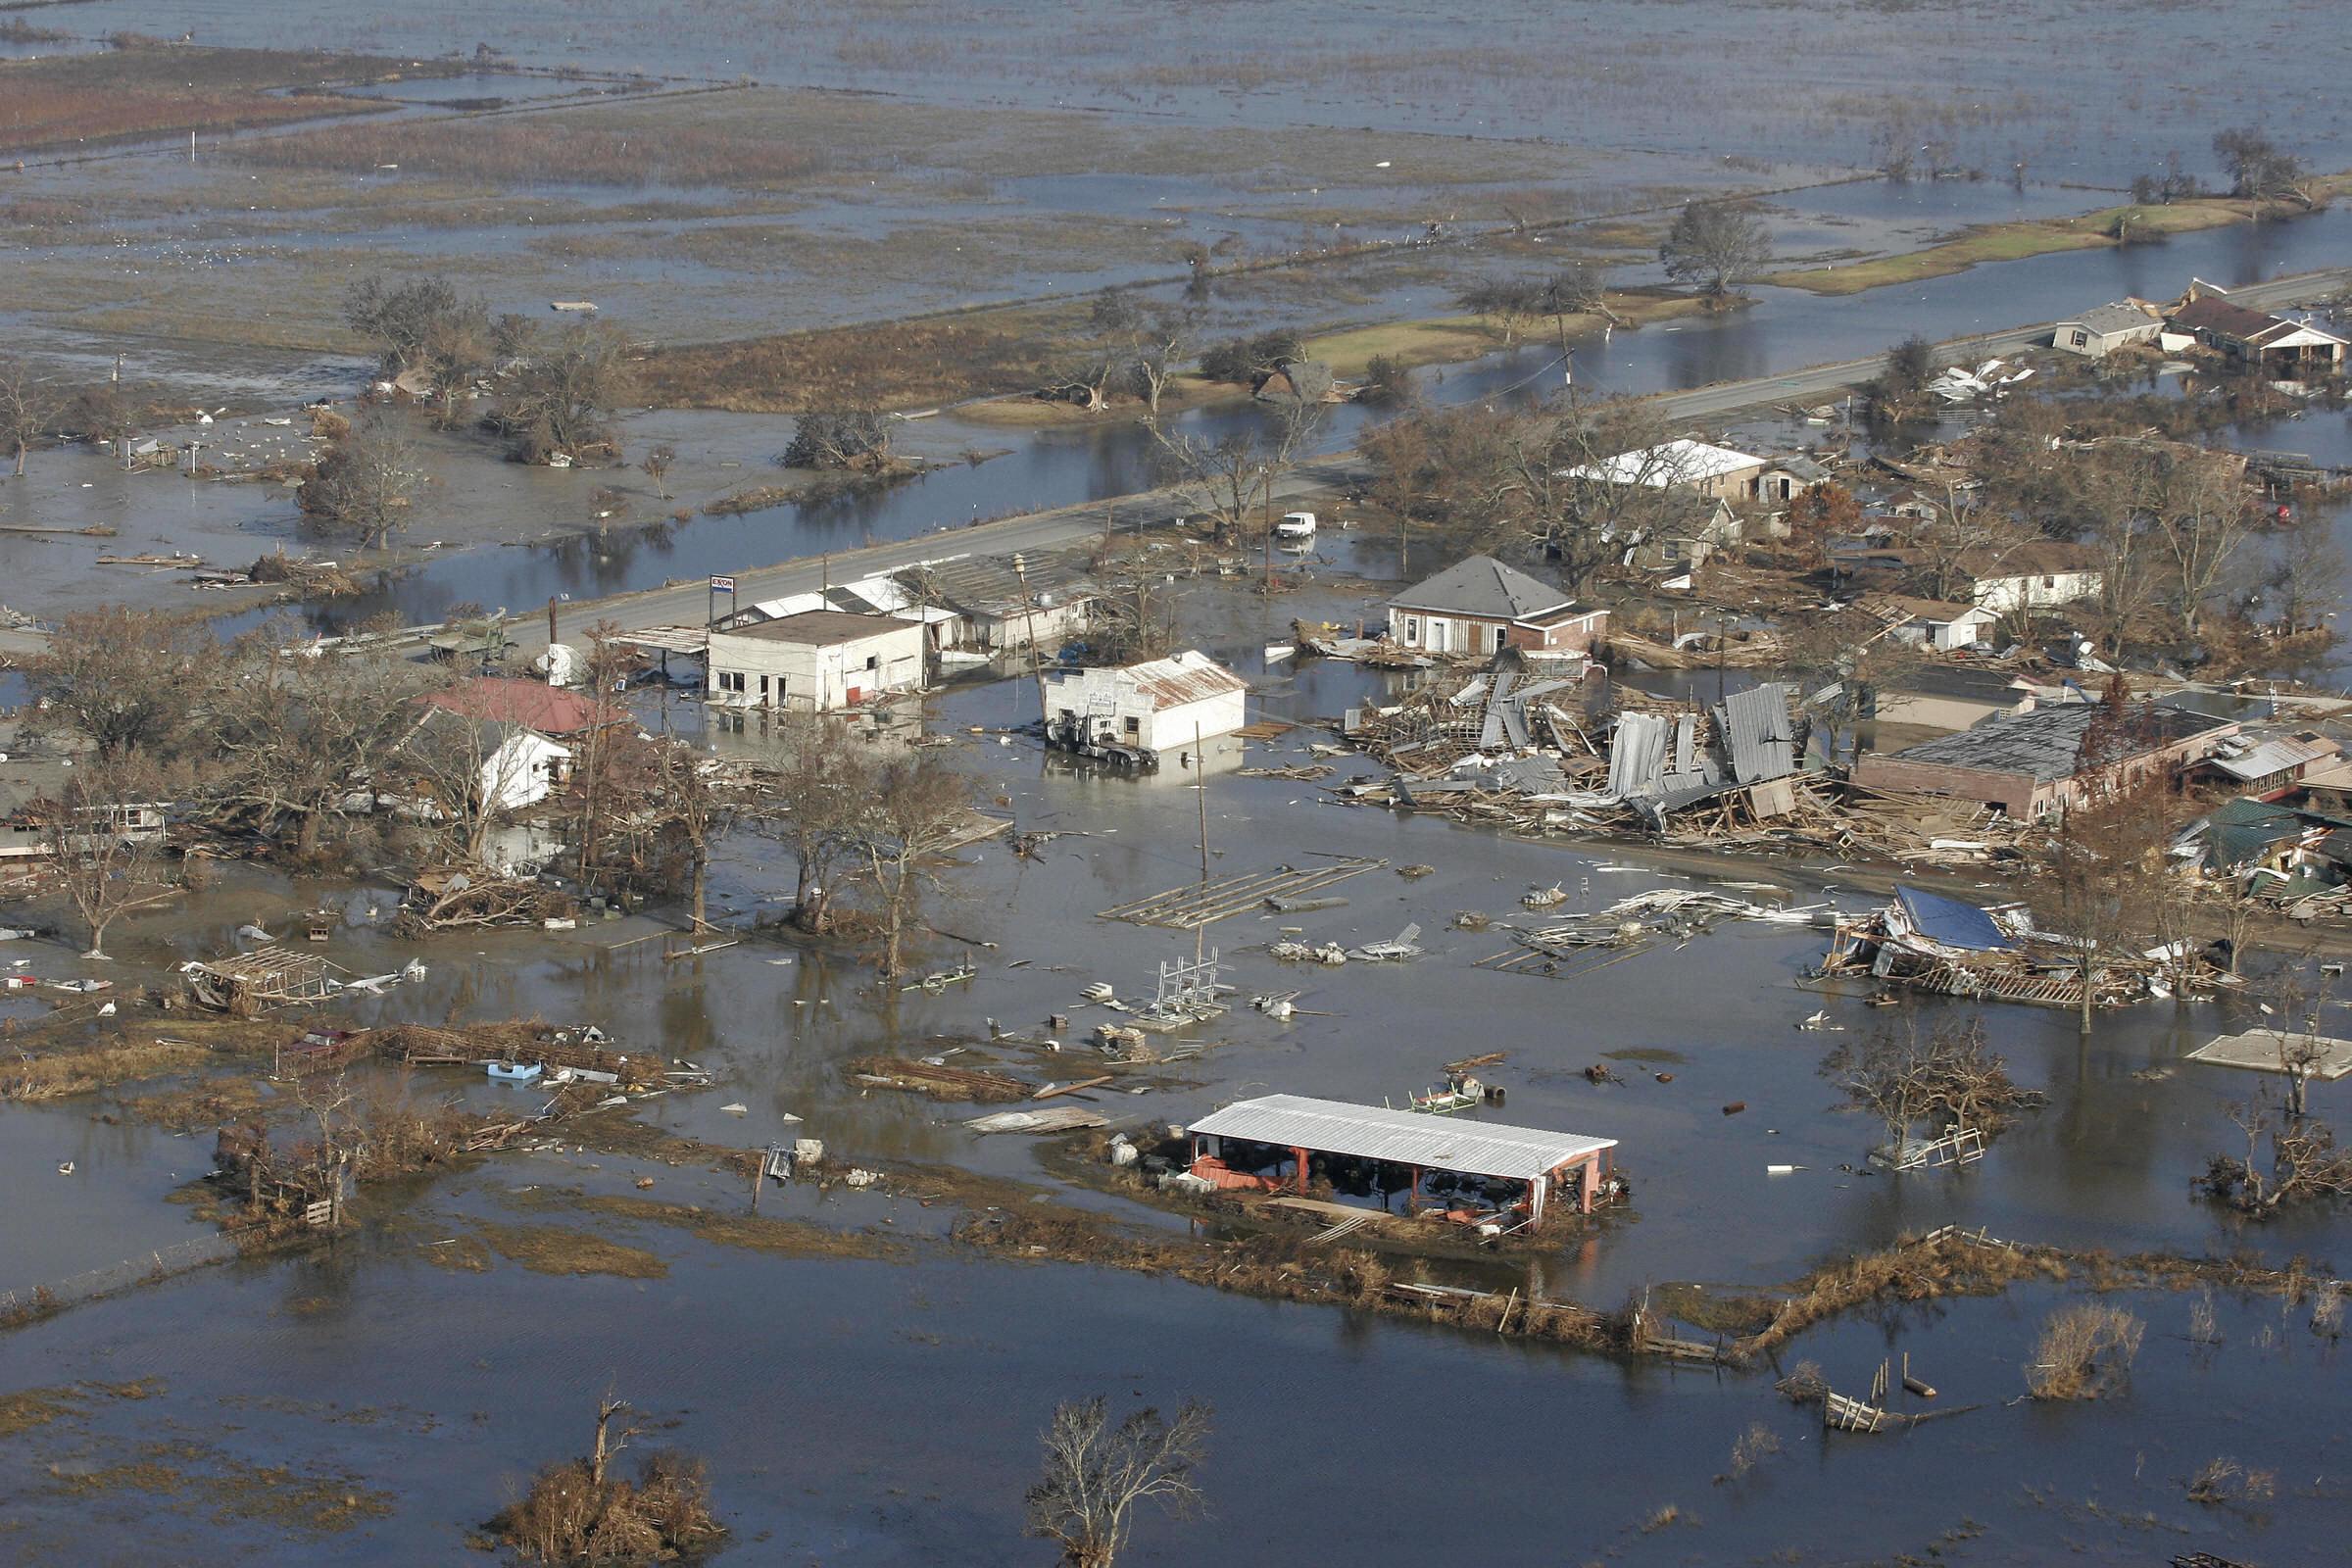 Flood waters in Cameron, La., after Hurricane Rita